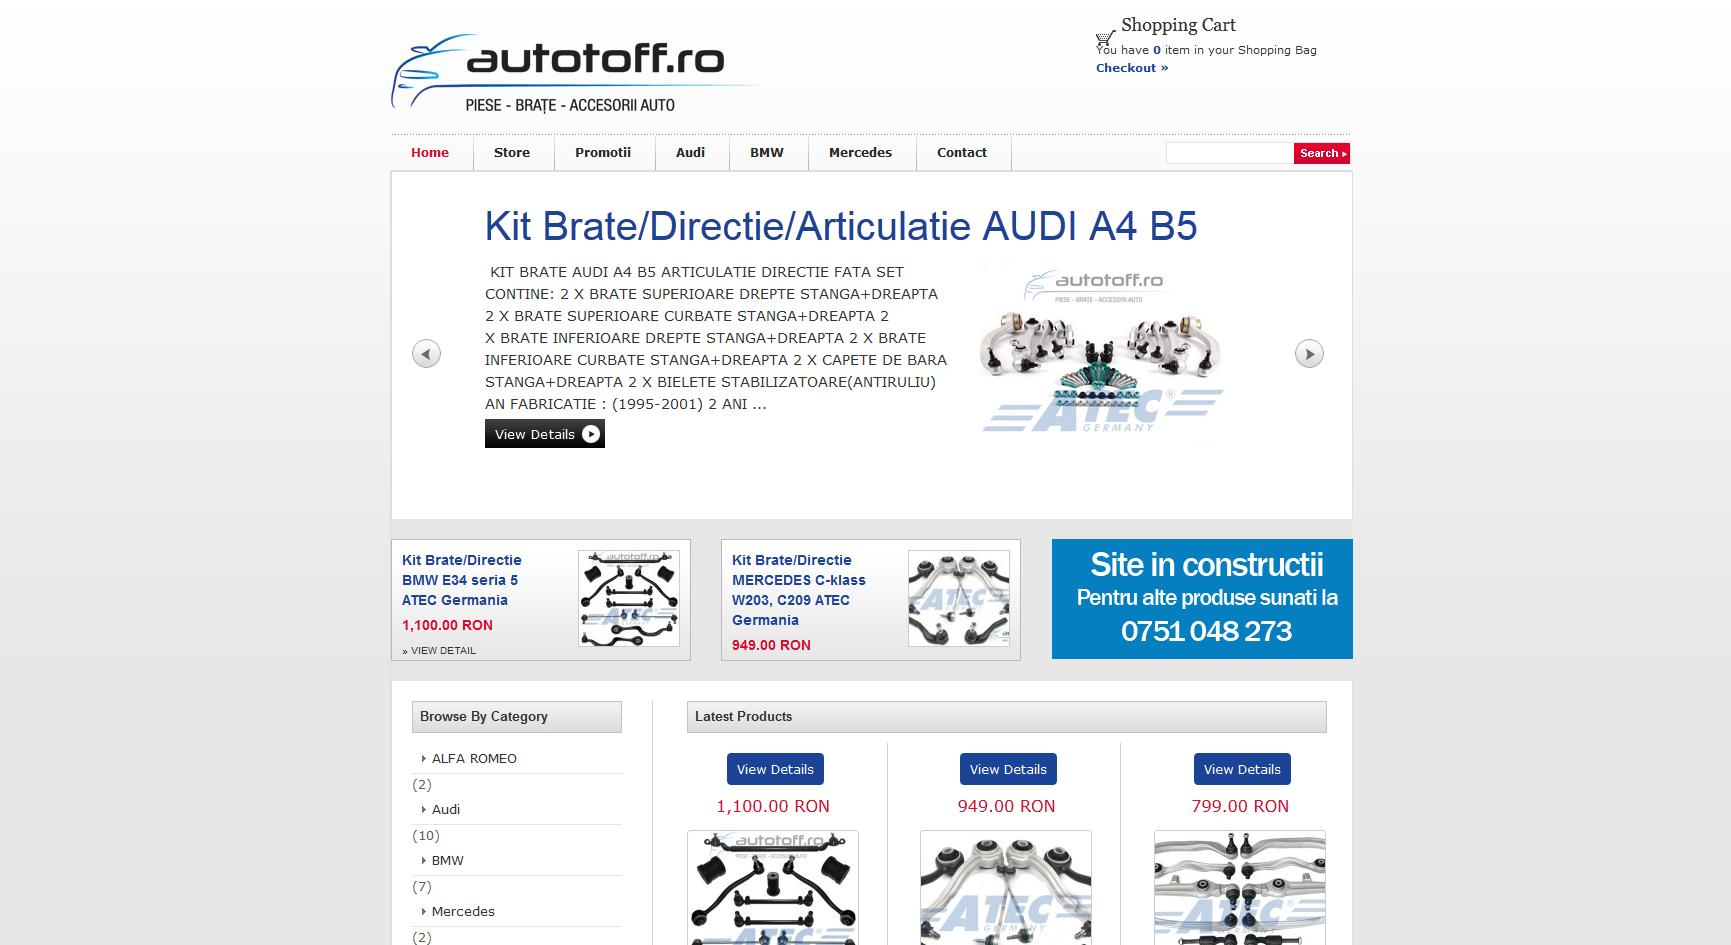 Web design magazin on-line cu piese auto